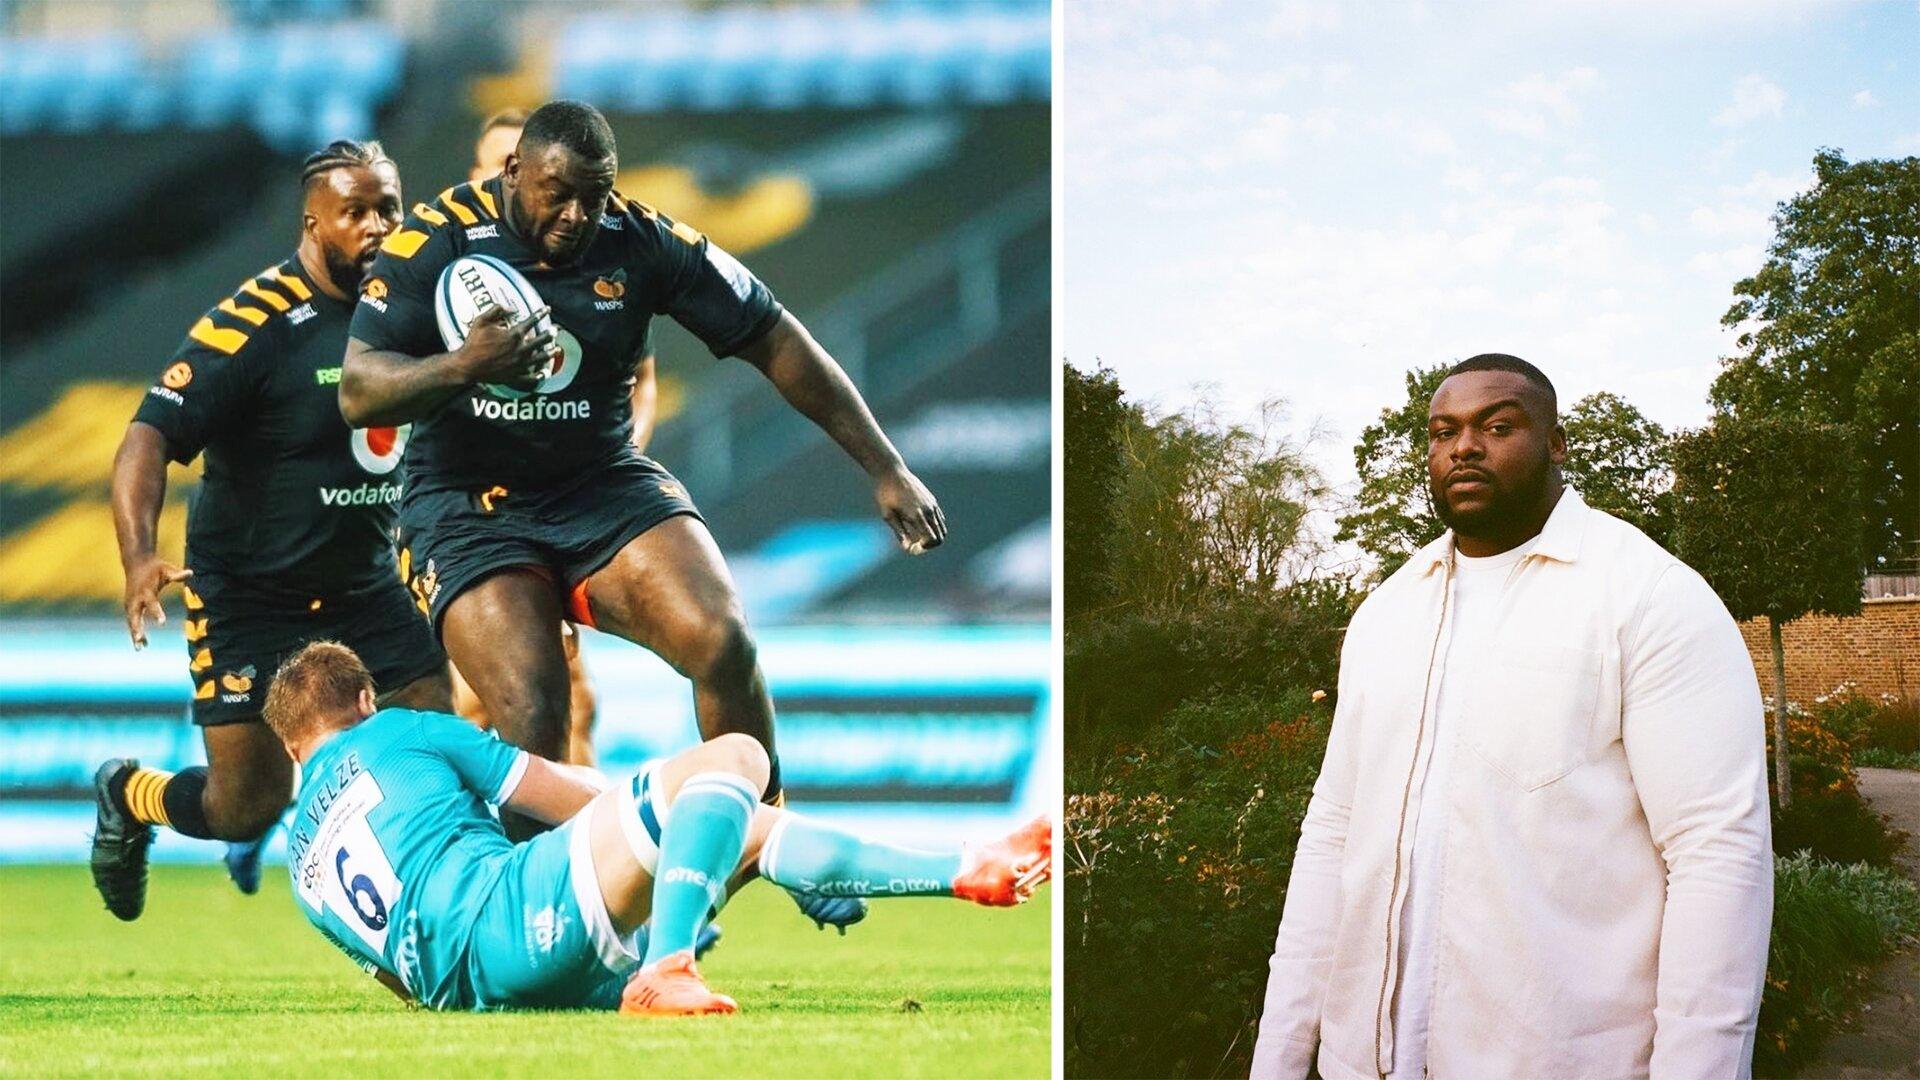 Wasps star Biyi Alo looking to break into UK music charts after extraordinary Premiership season